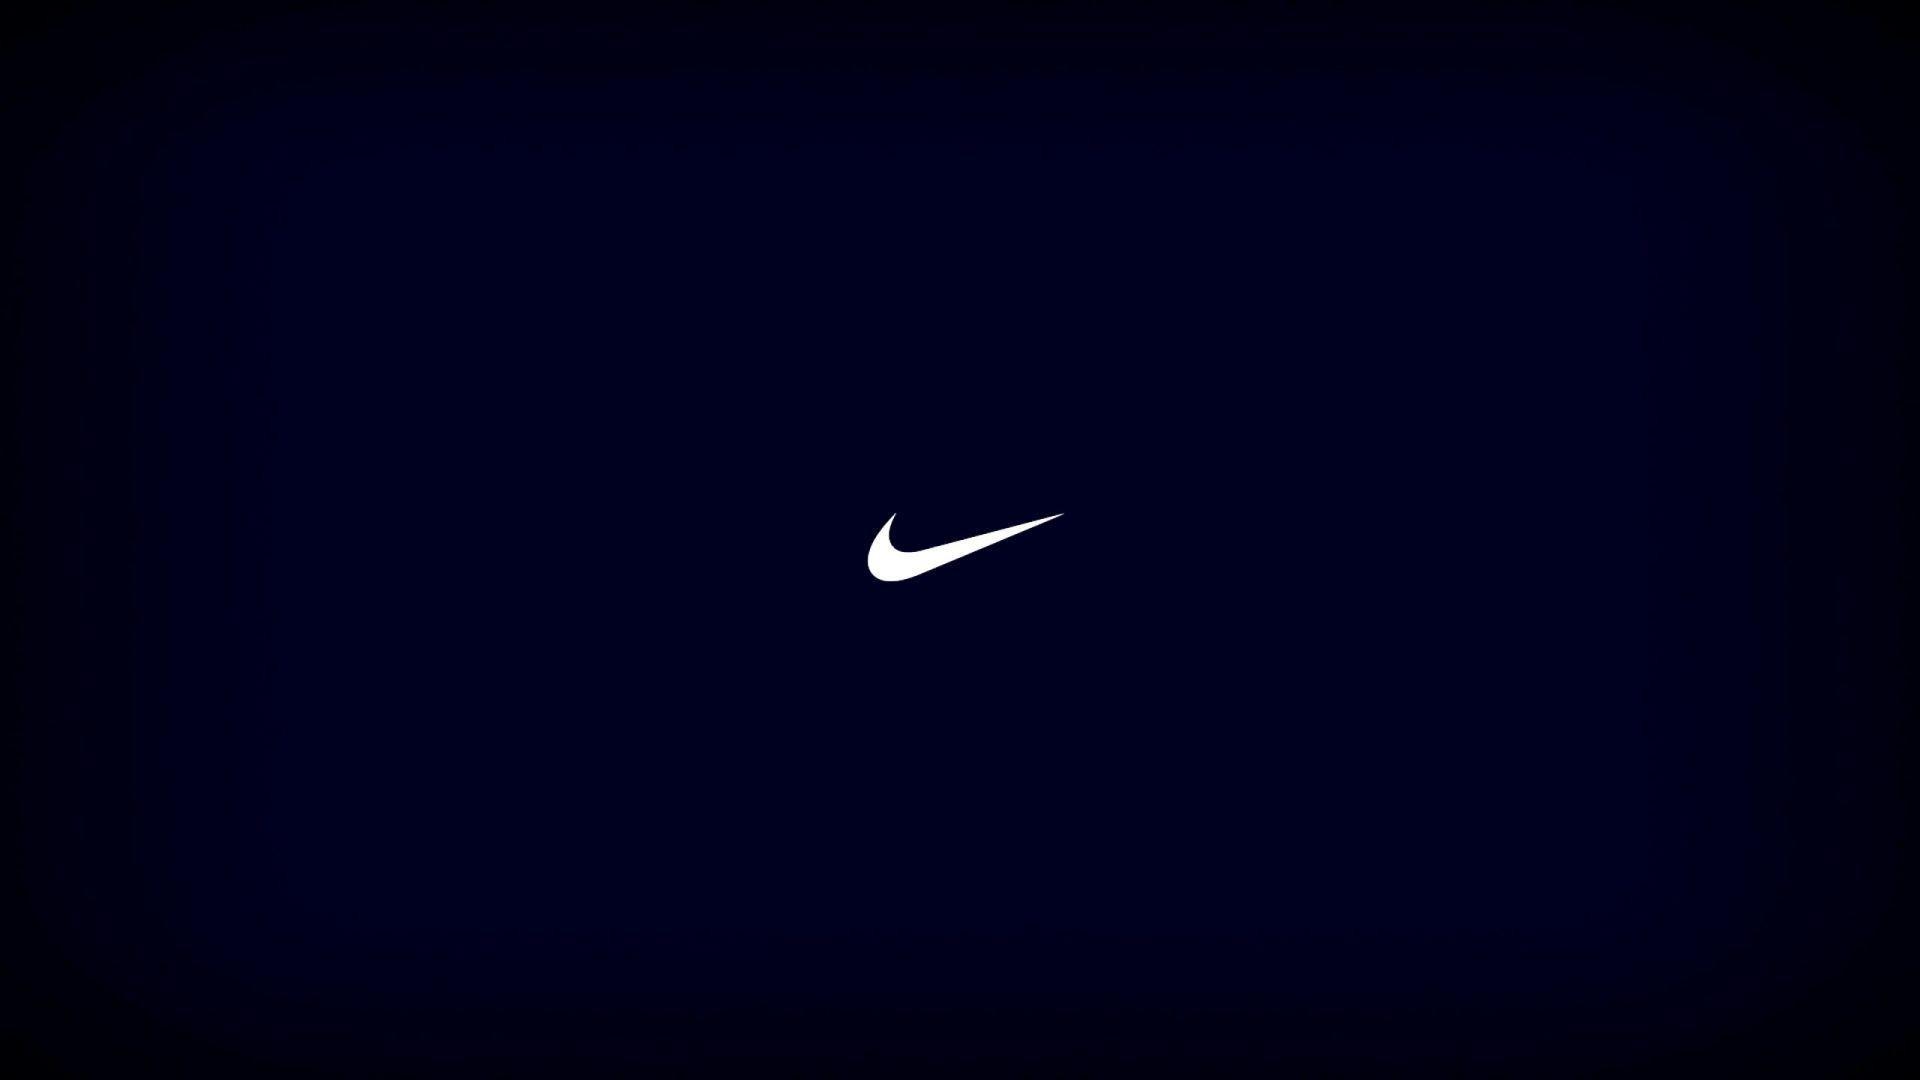 Res: 1920x1080, Nike Logo Drop Water Wallpaper HD #5843 Wallpaper | High .